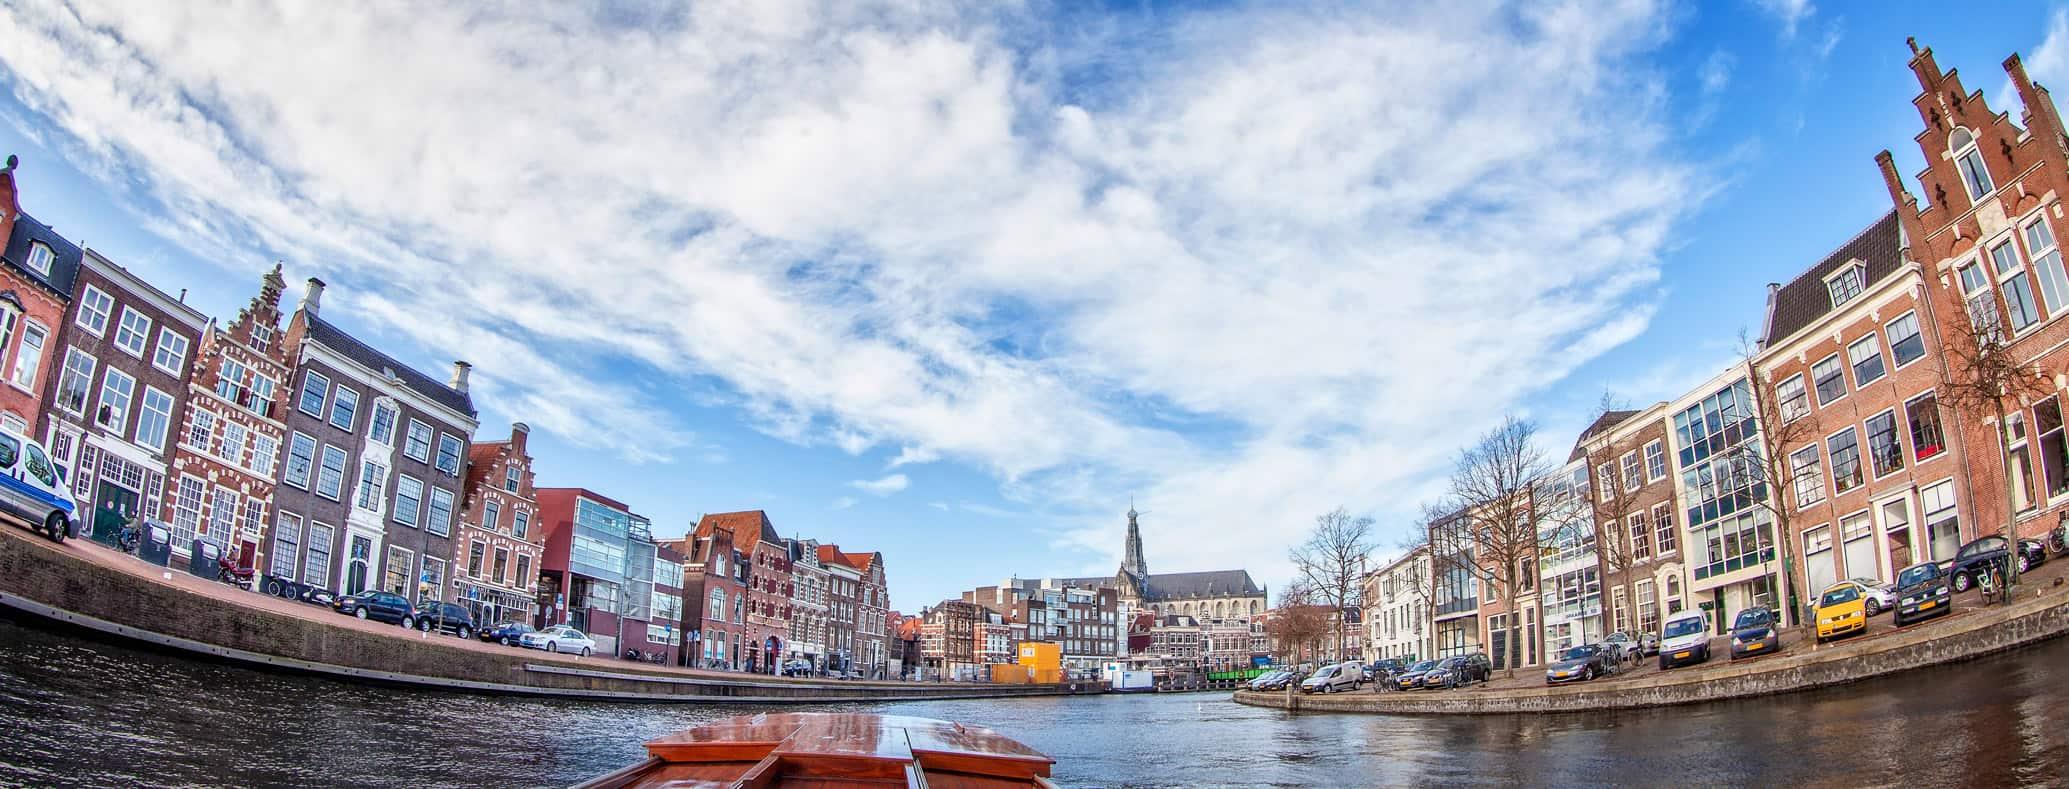 professional photographer Haarlem